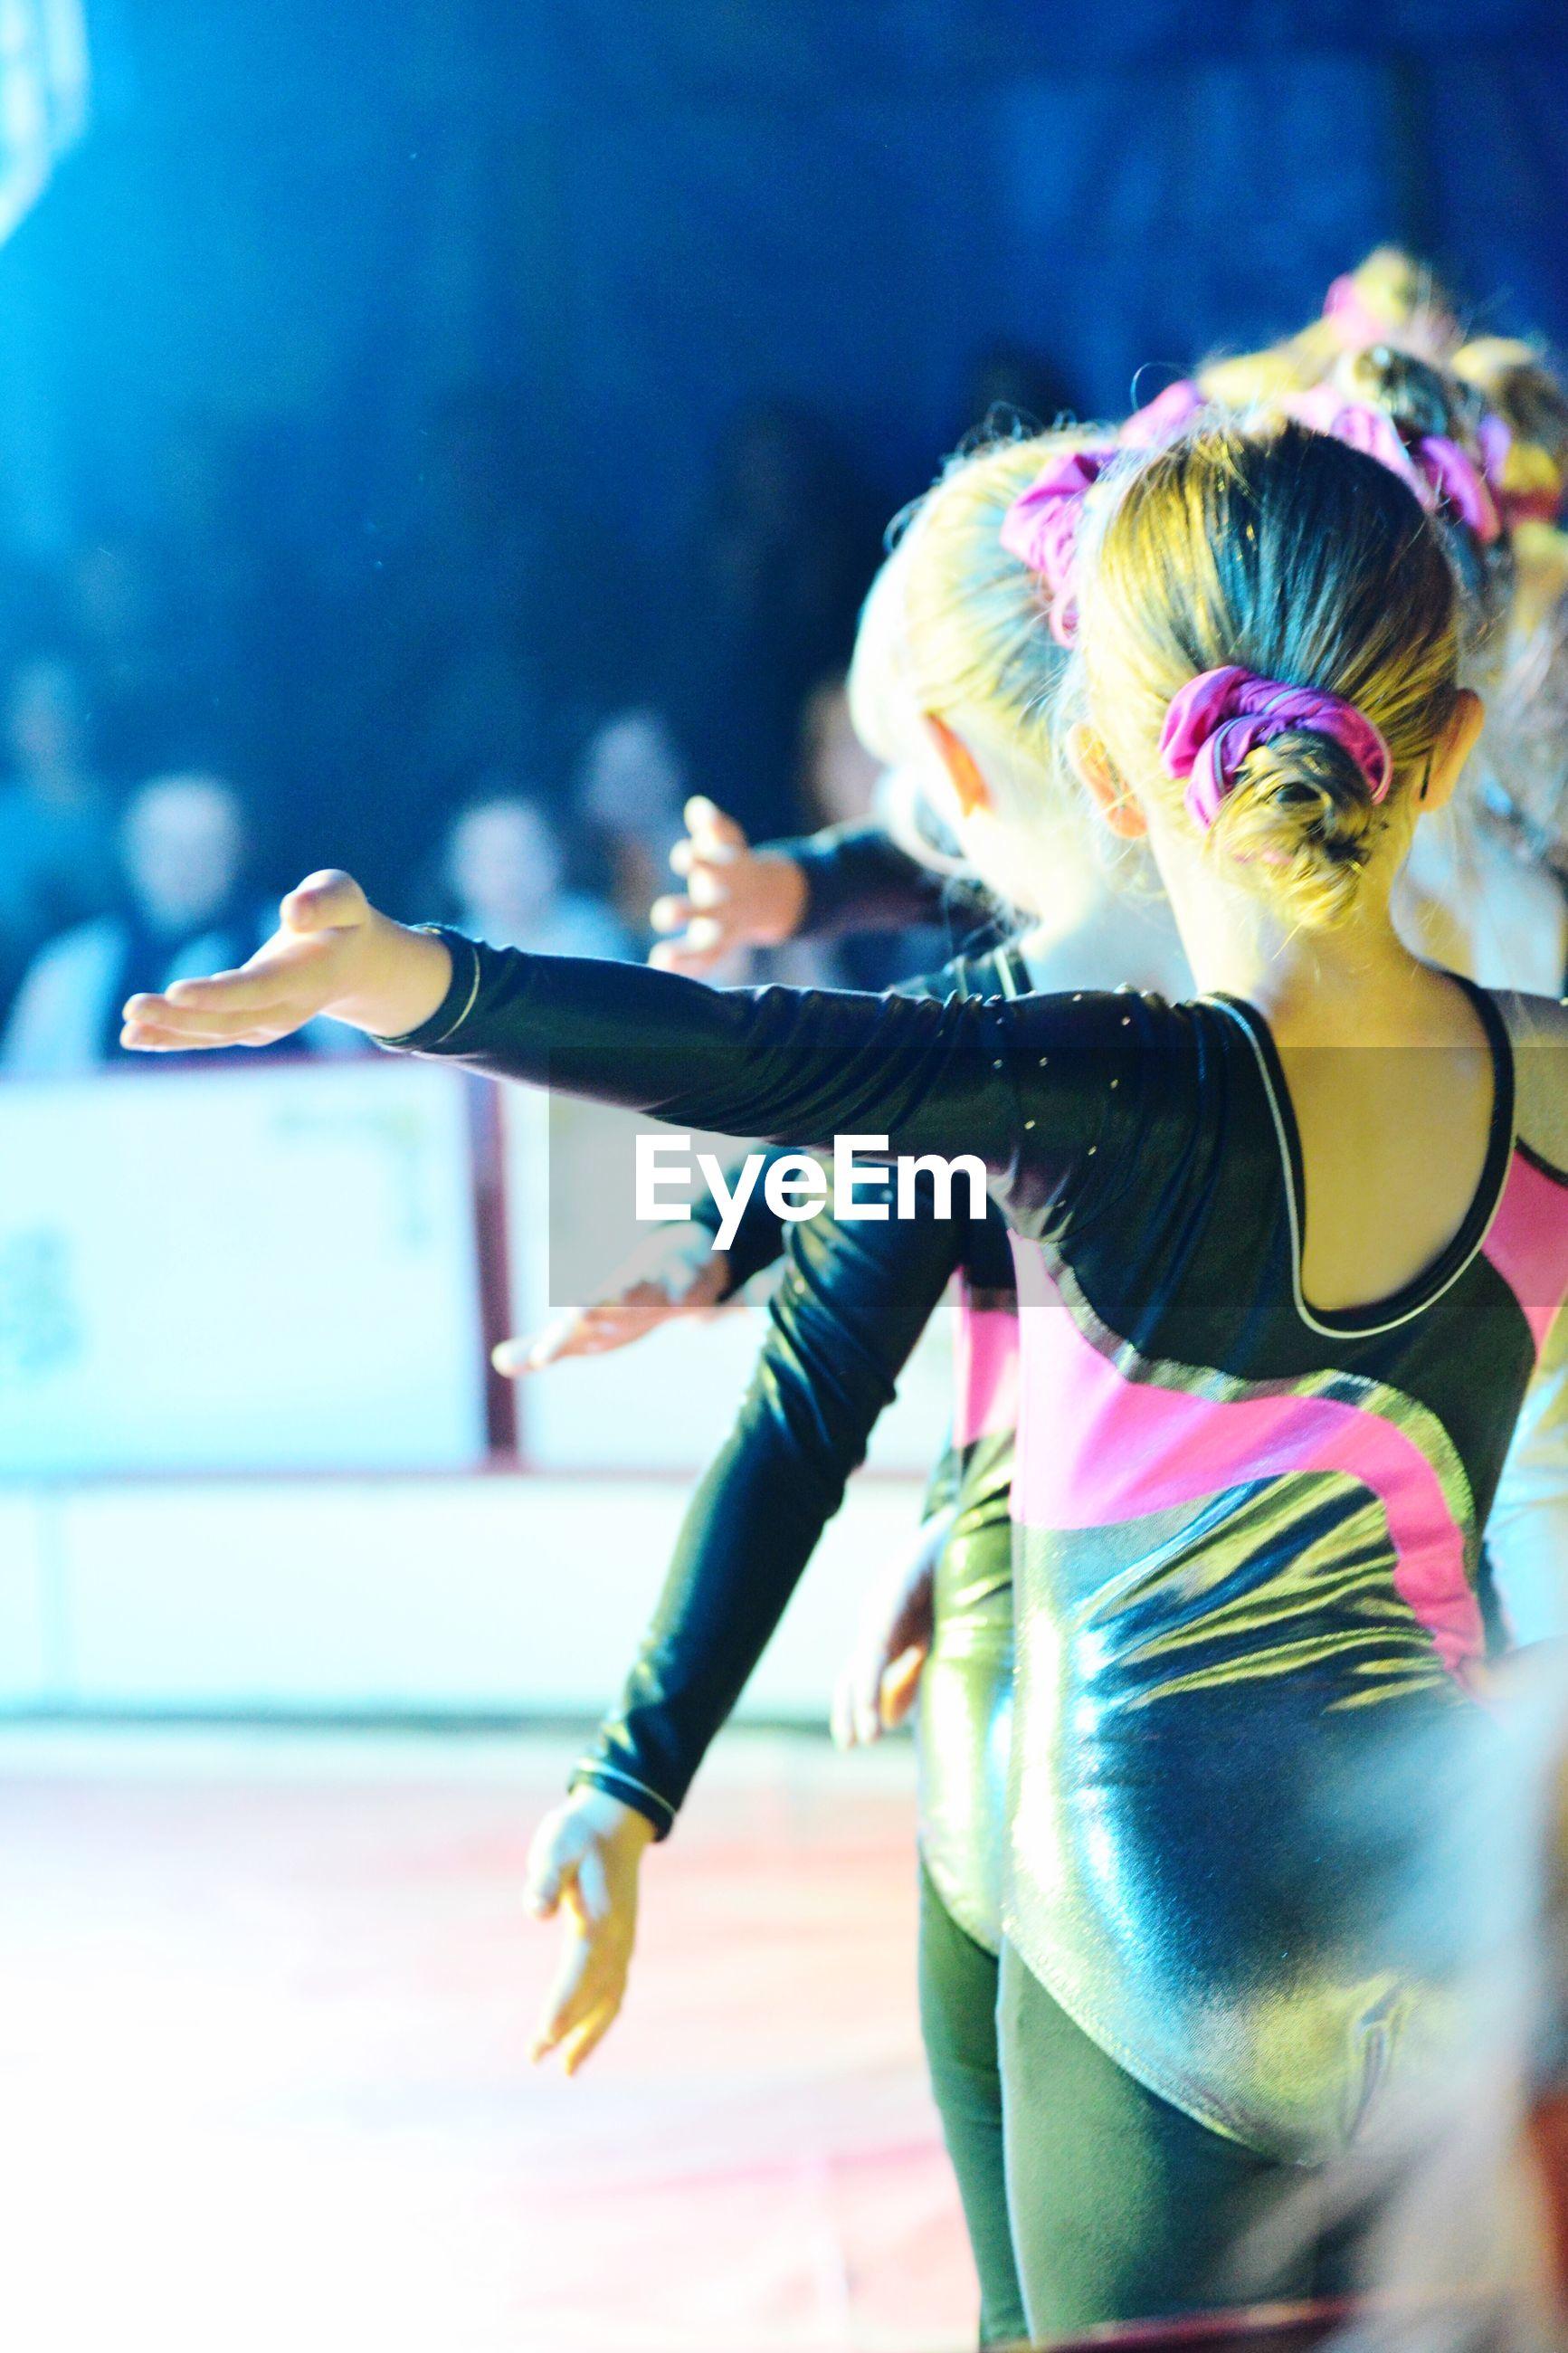 FULL LENGTH REAR VIEW OF WOMAN DANCING AT NIGHTCLUB